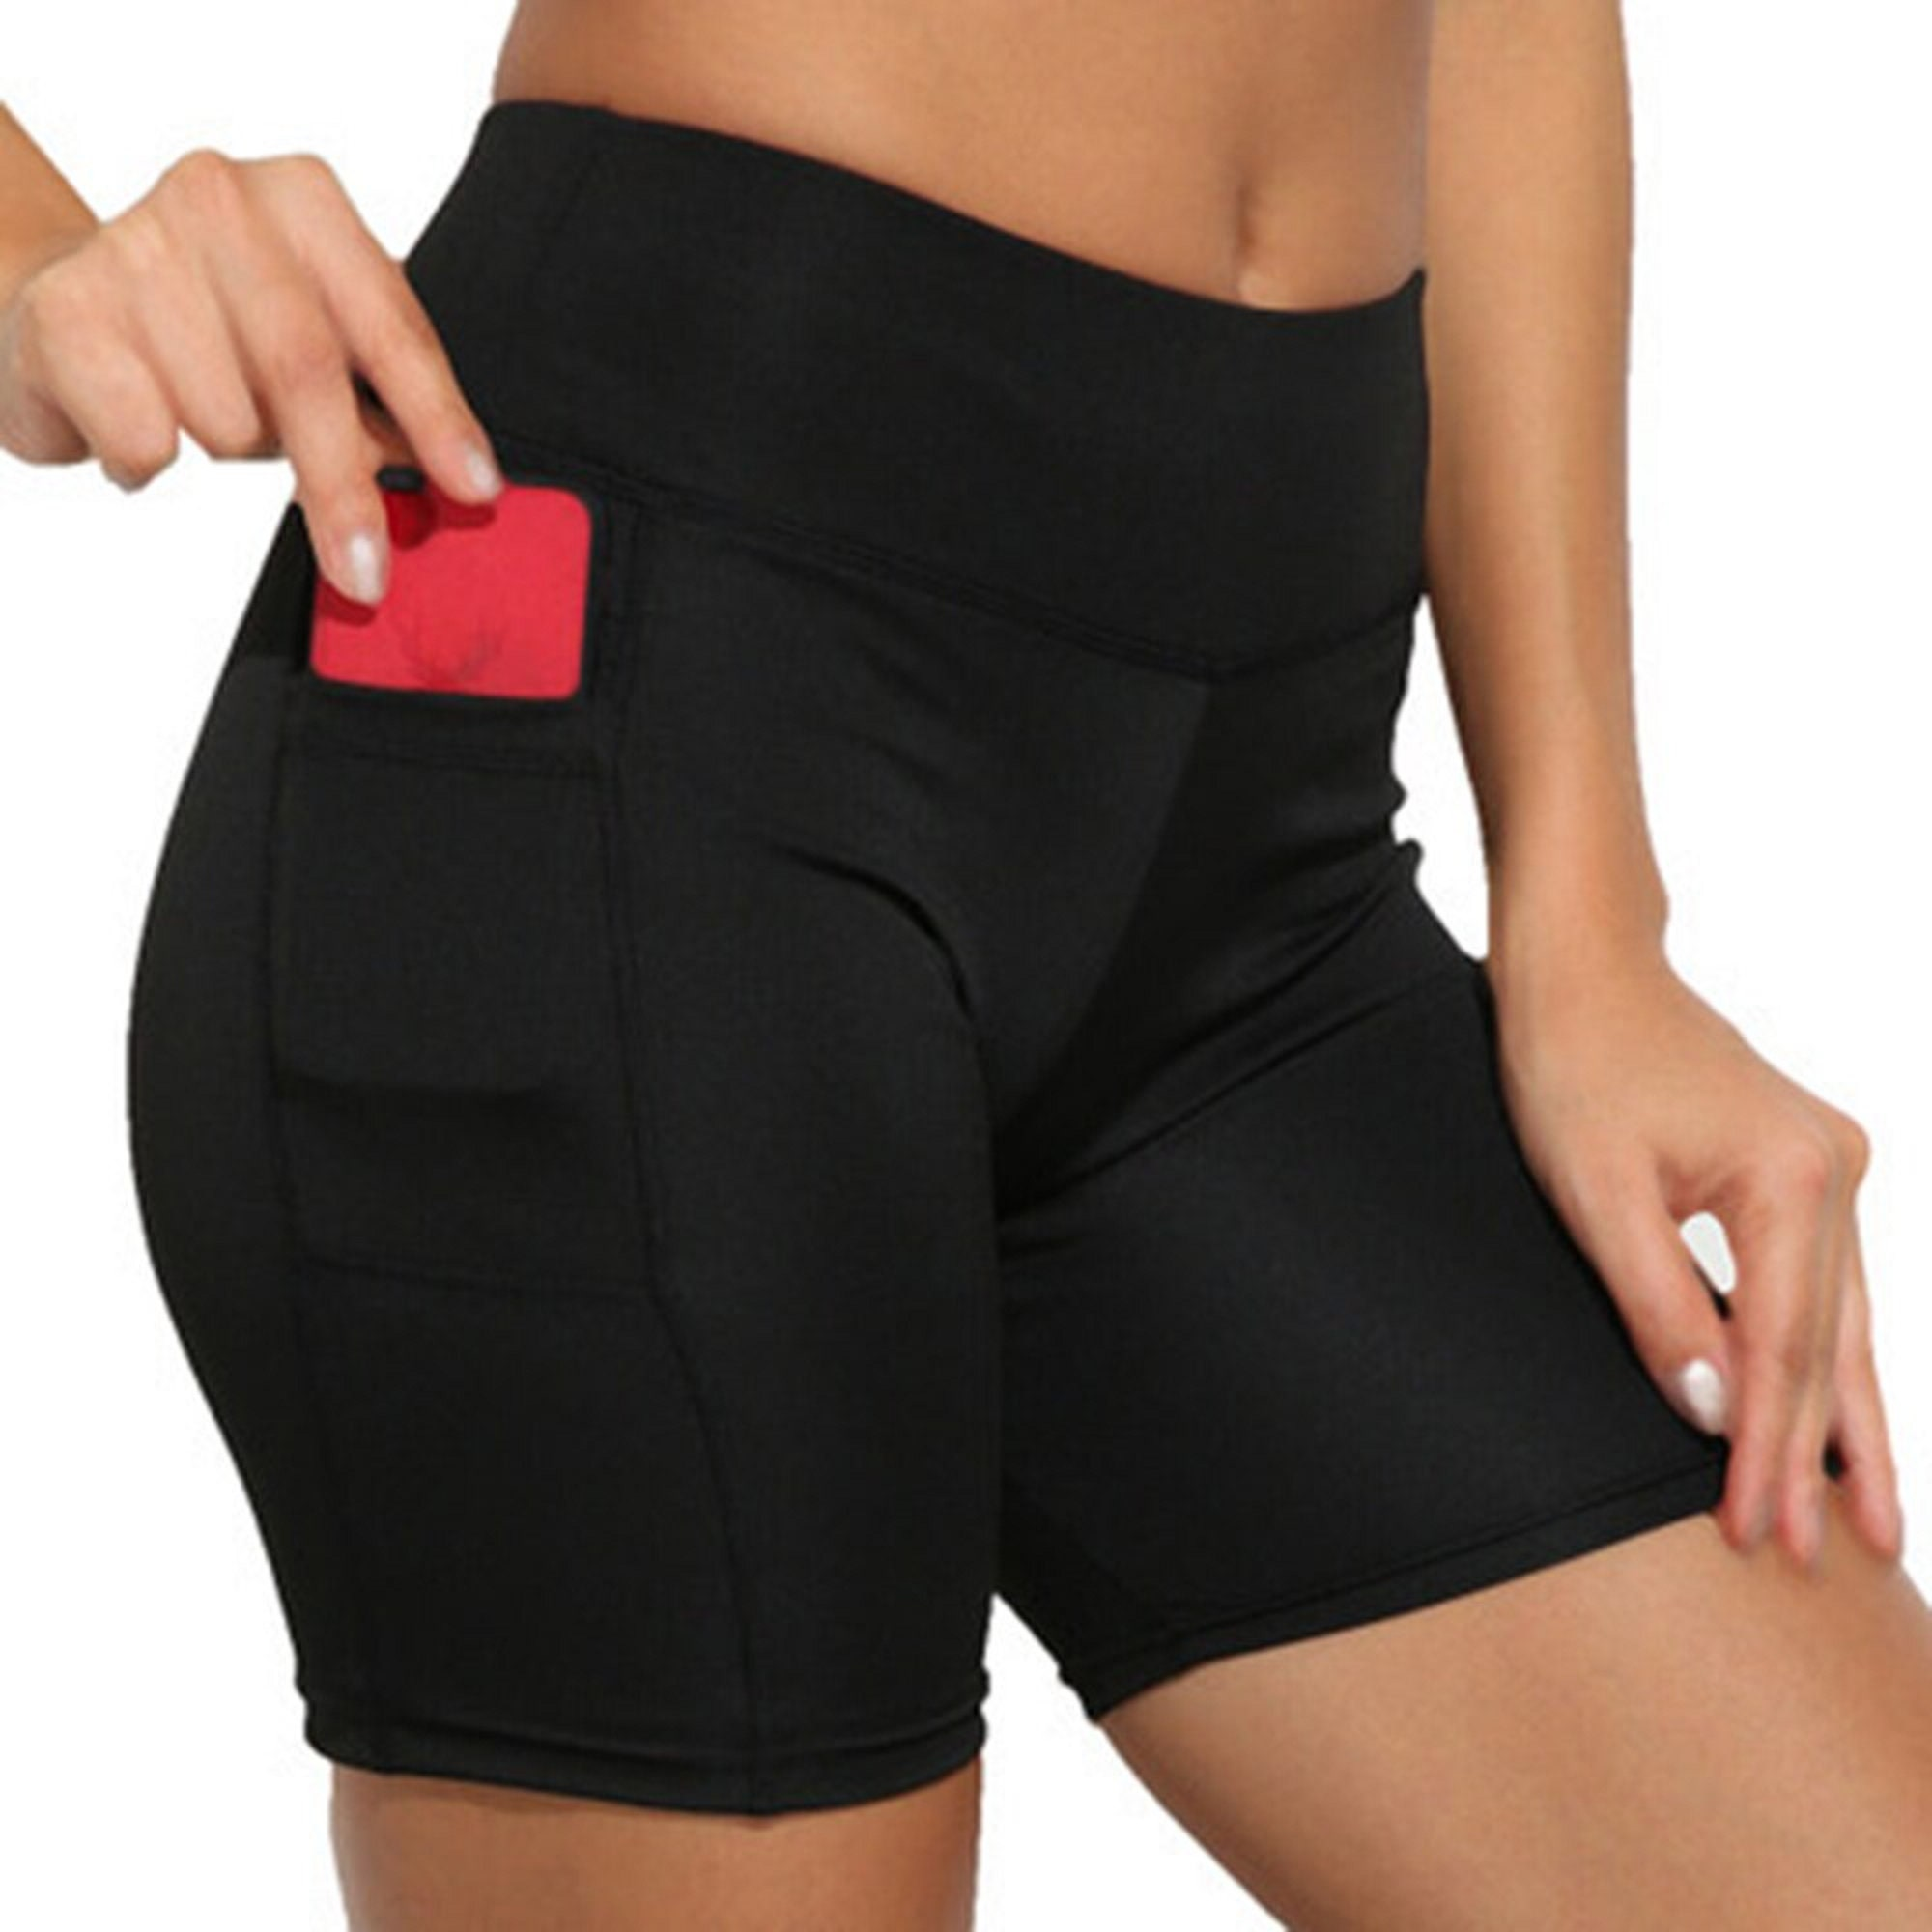 Women's shorts High Waist Workout Yoga Shorts With Pockets Fitness Sportswear Scrunch Butt Yoga Running Shorts Gym Leggings